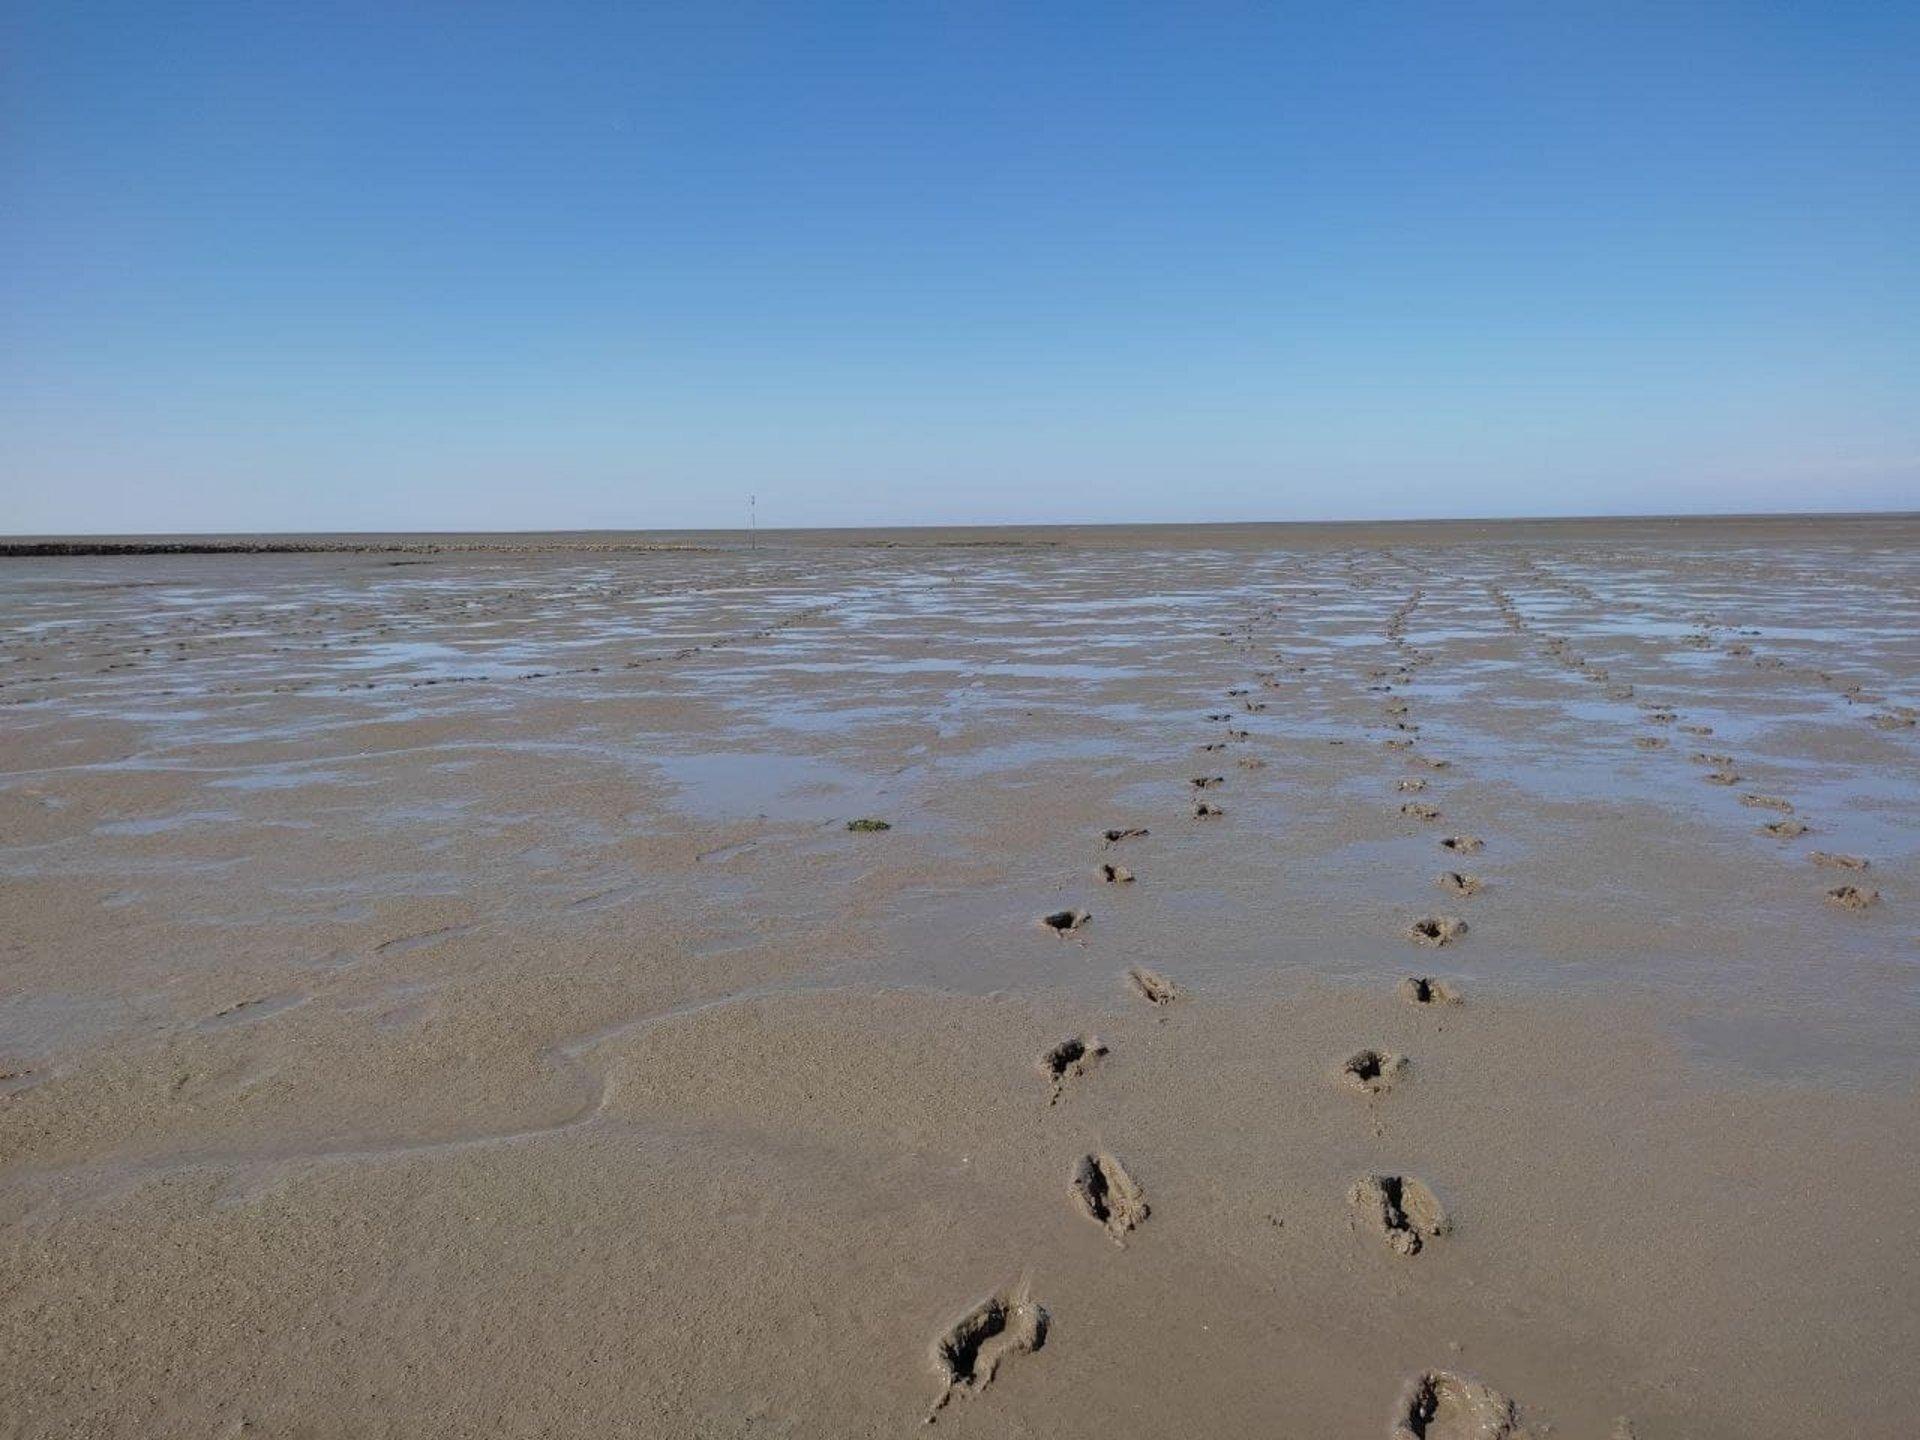 Fußspuren im endlosen Watt (Foto Johanna Böttcher)